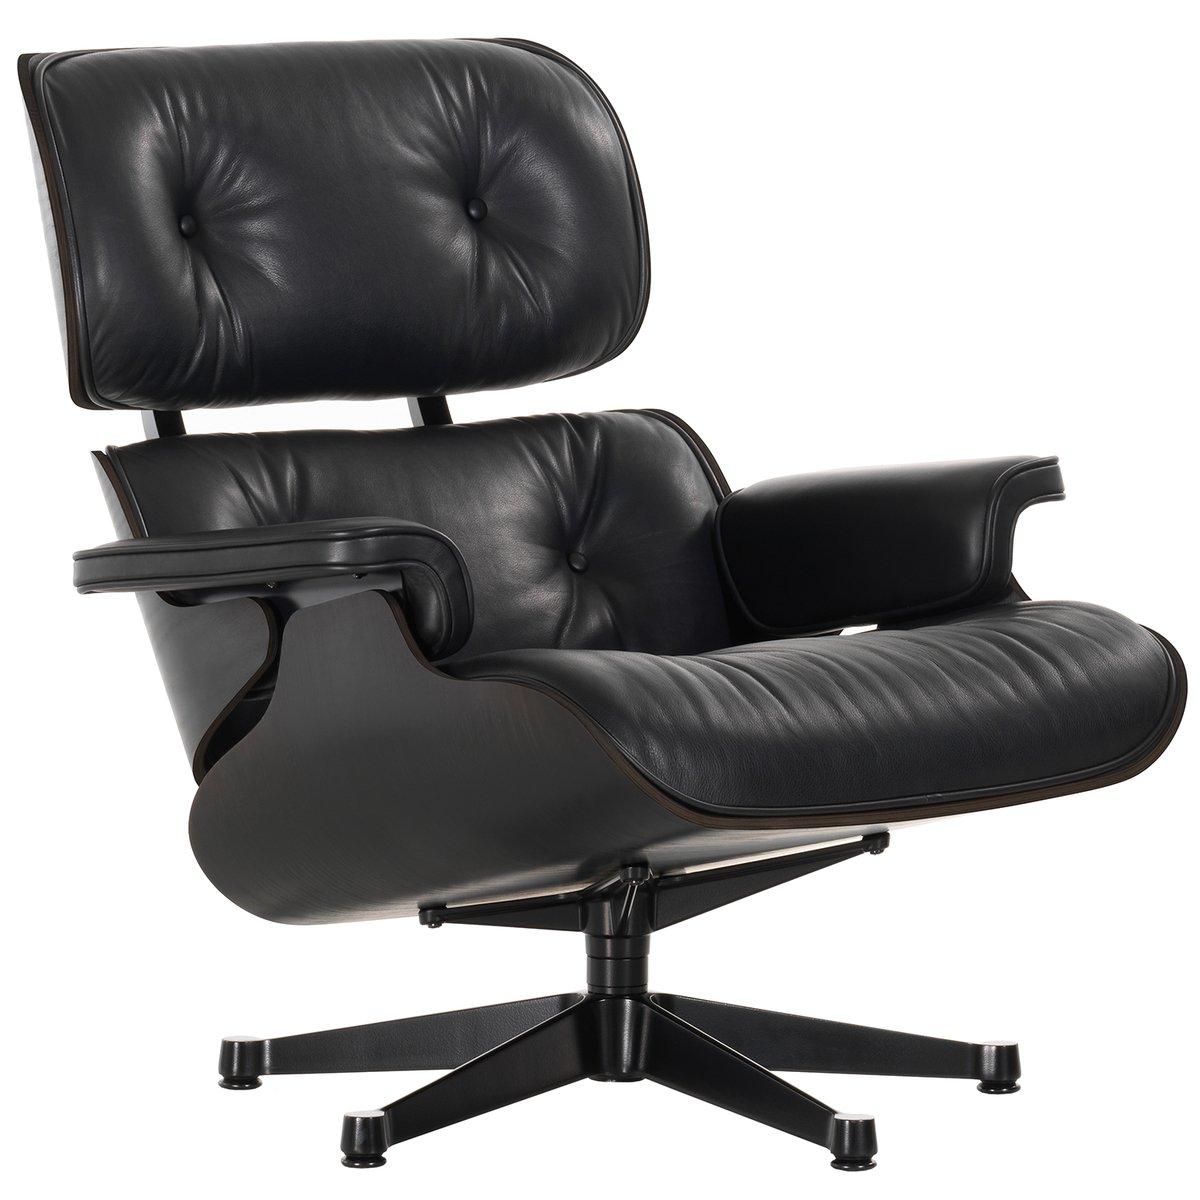 Astonishing Vitra Eames Lounge Chair Classic Size Black Ash Black Uwap Interior Chair Design Uwaporg